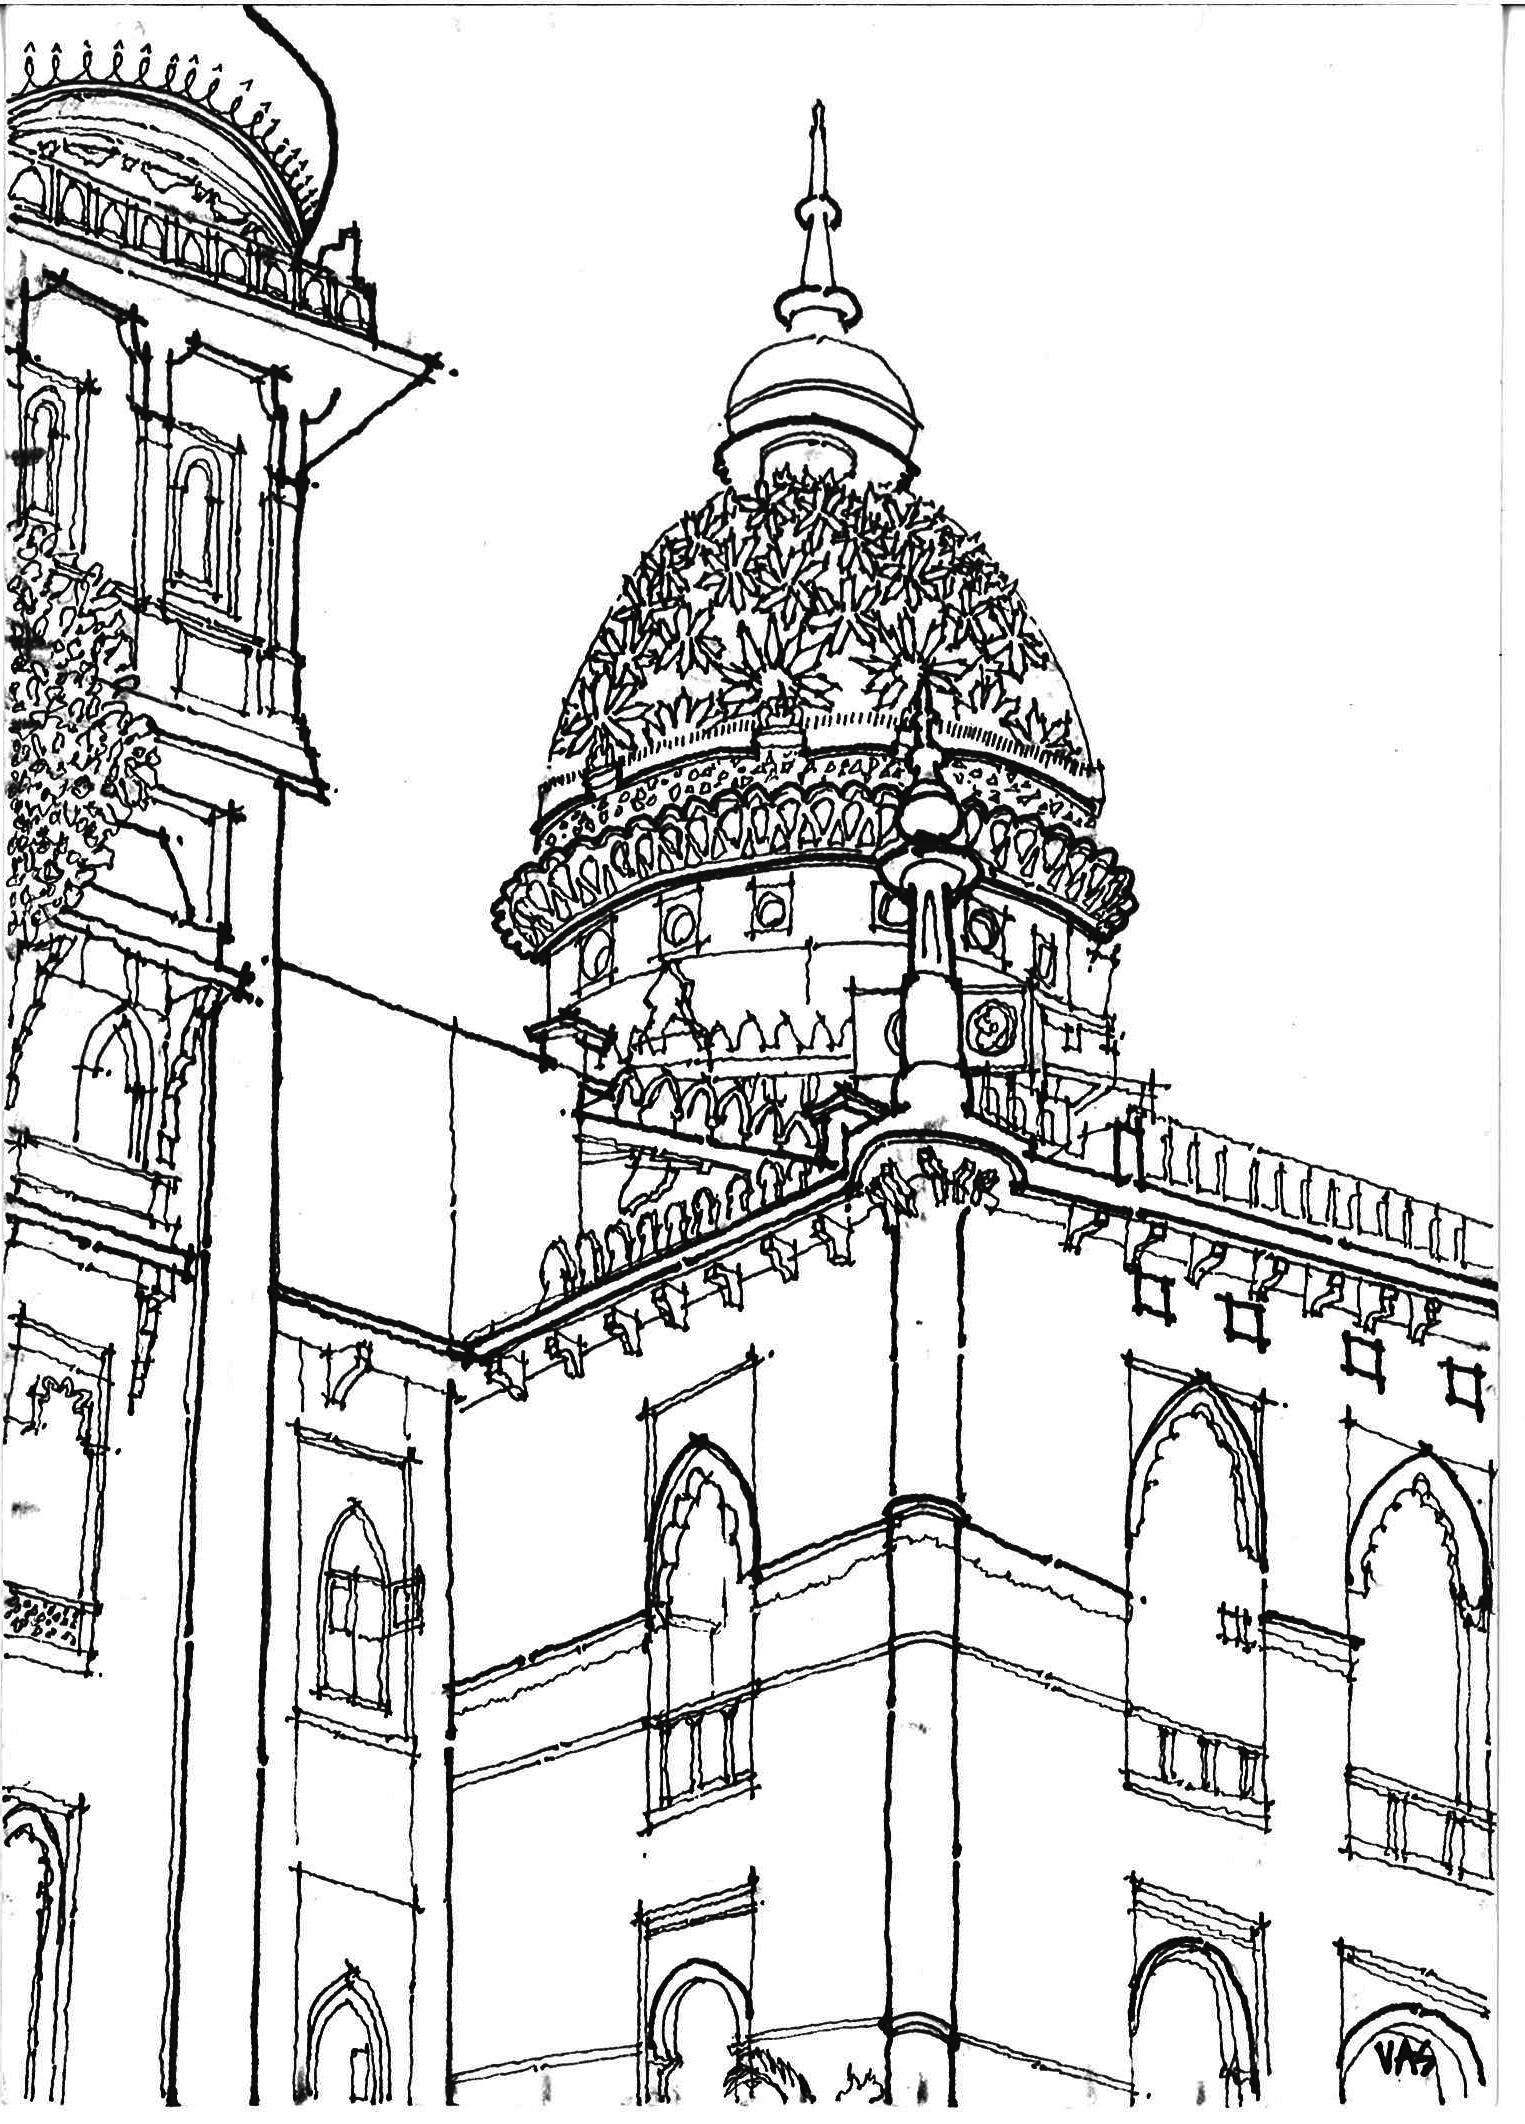 white cathedral helsinki finland wiring diagram database. Black Bedroom Furniture Sets. Home Design Ideas